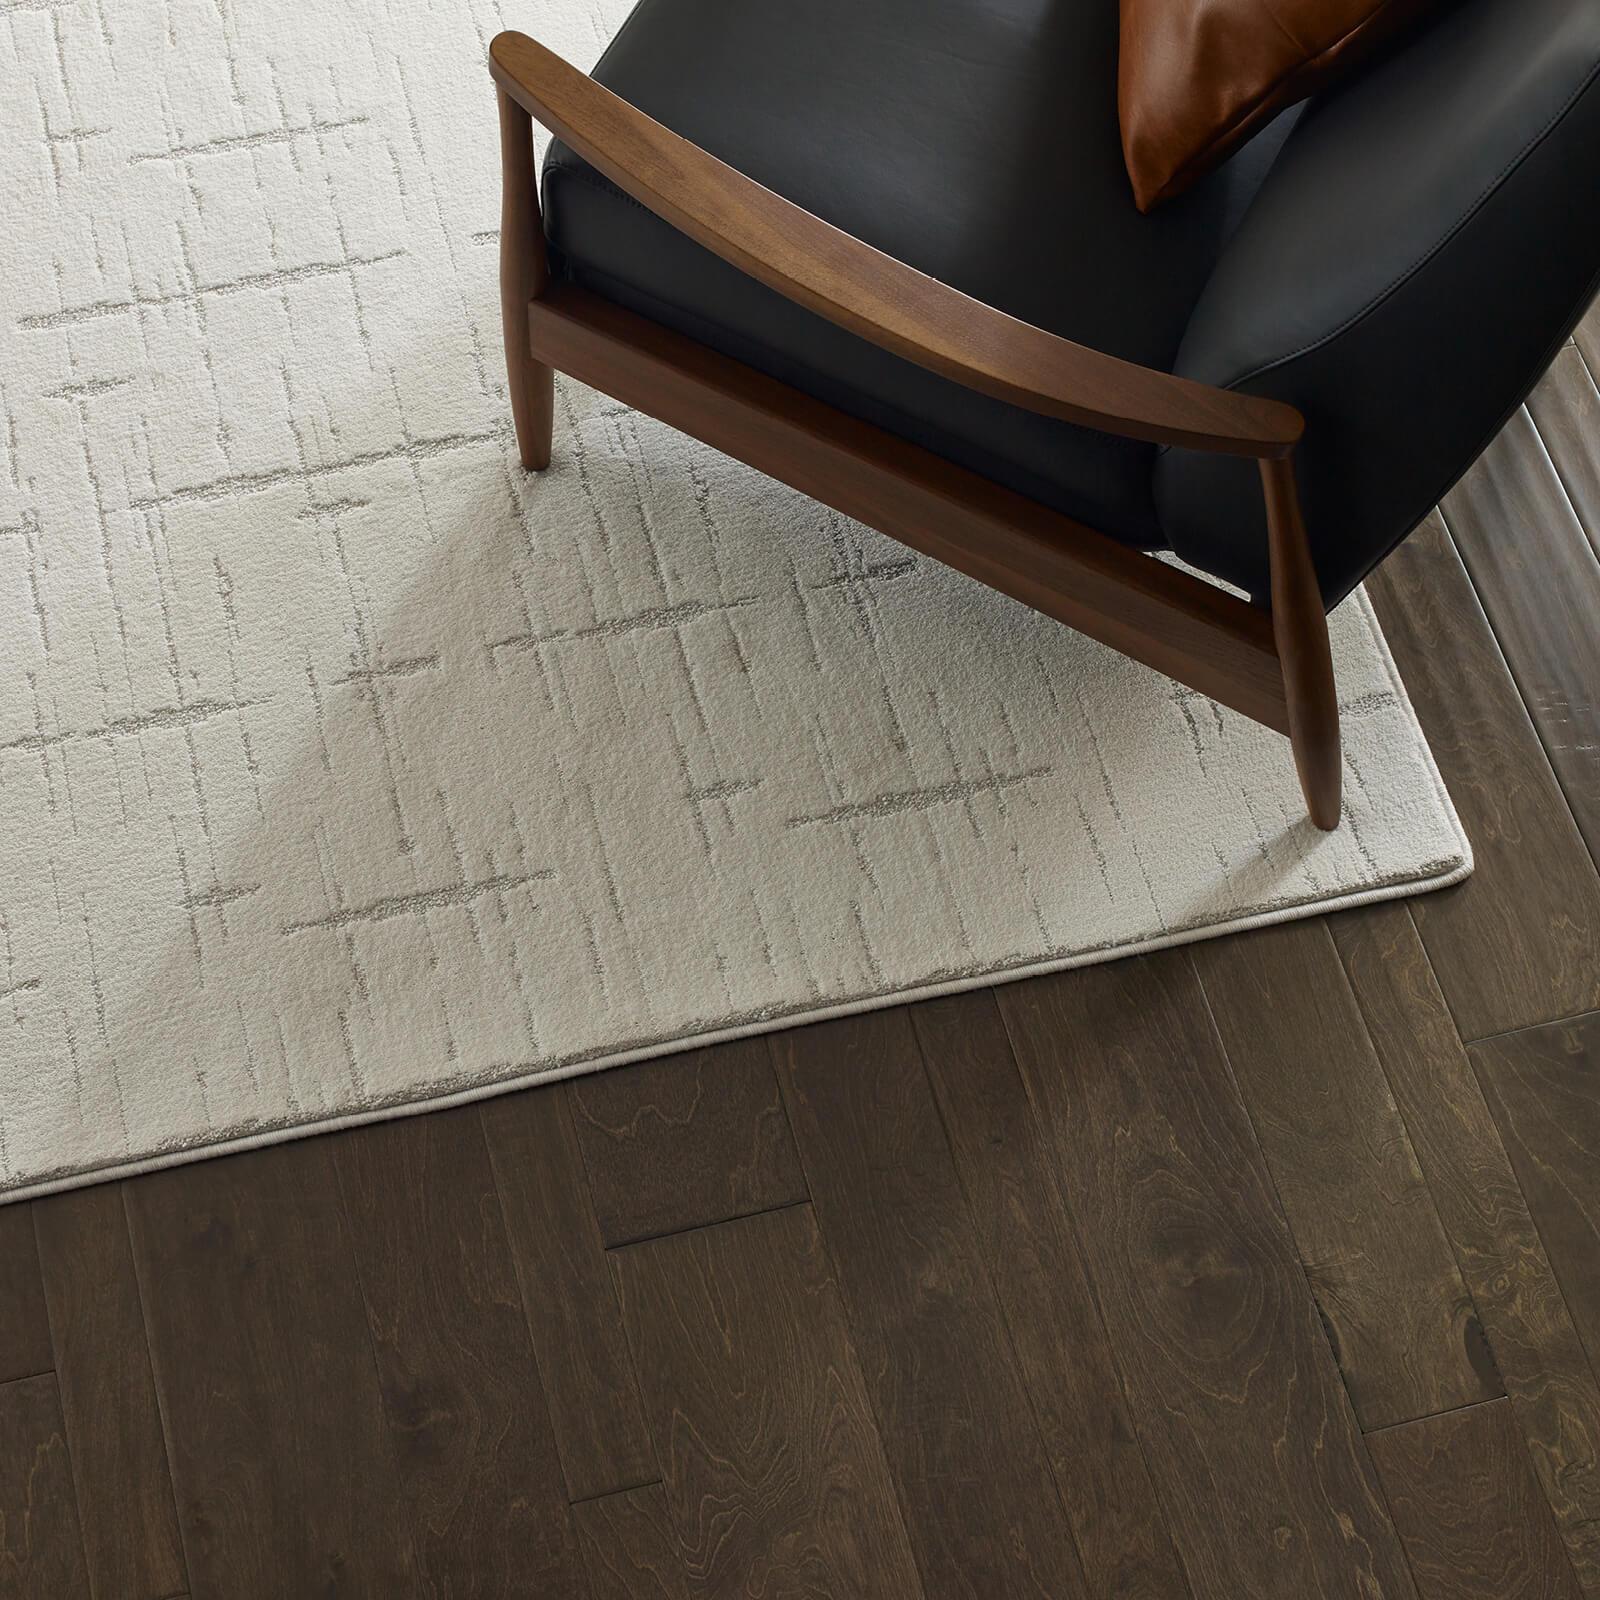 Key West hardwood Flooring | Gilman Floors